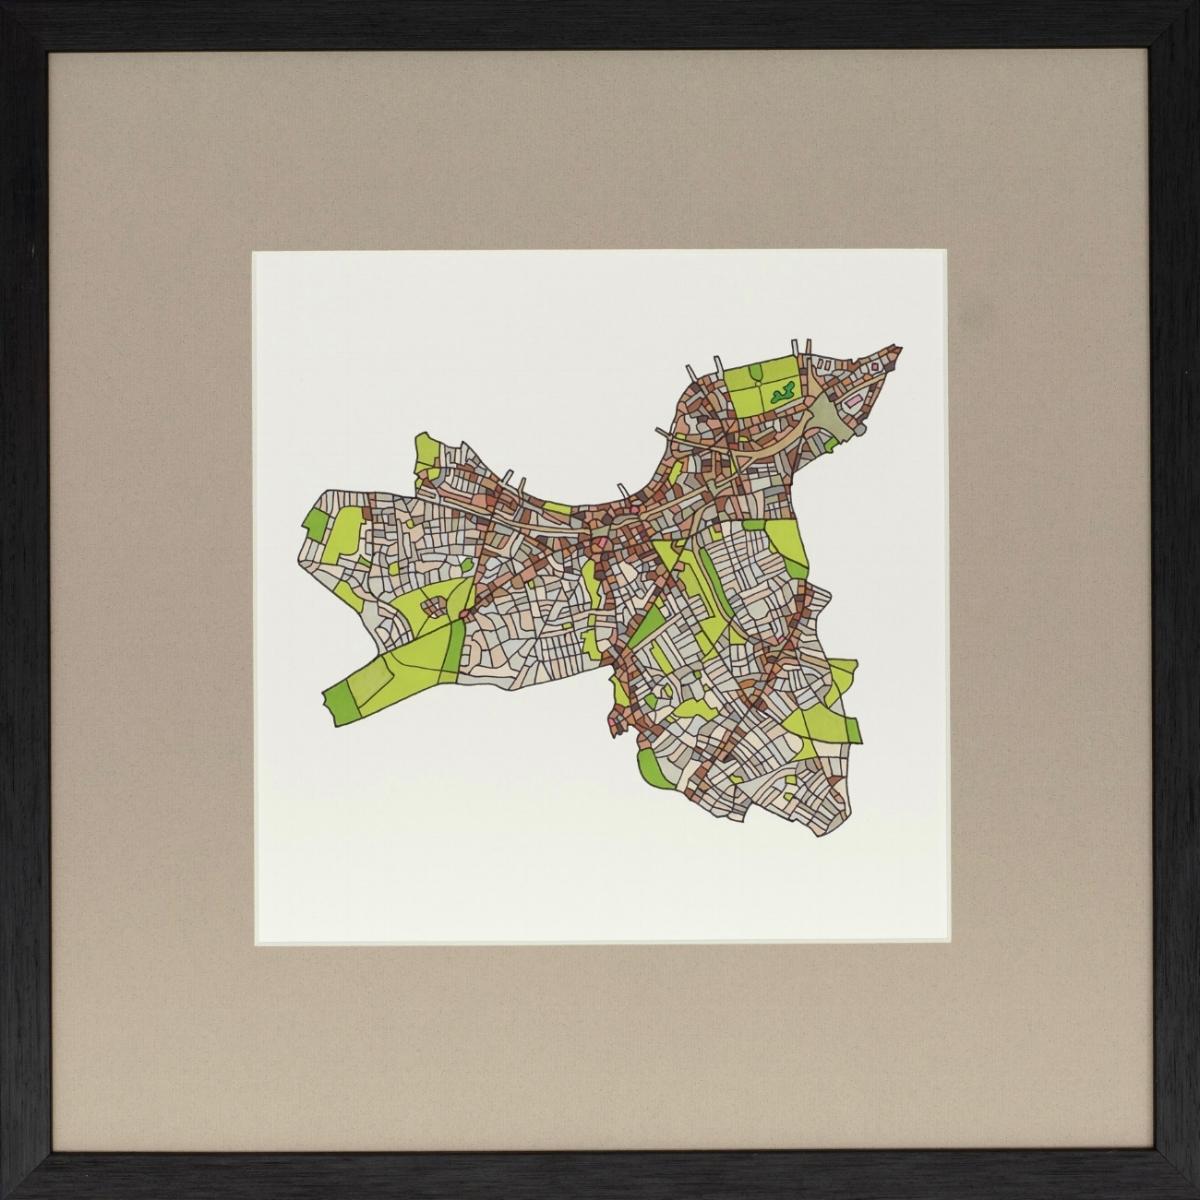 London Borough of Wandsworth 2018 | Ink on Paper | 44 x 44 cm (framed) | £450